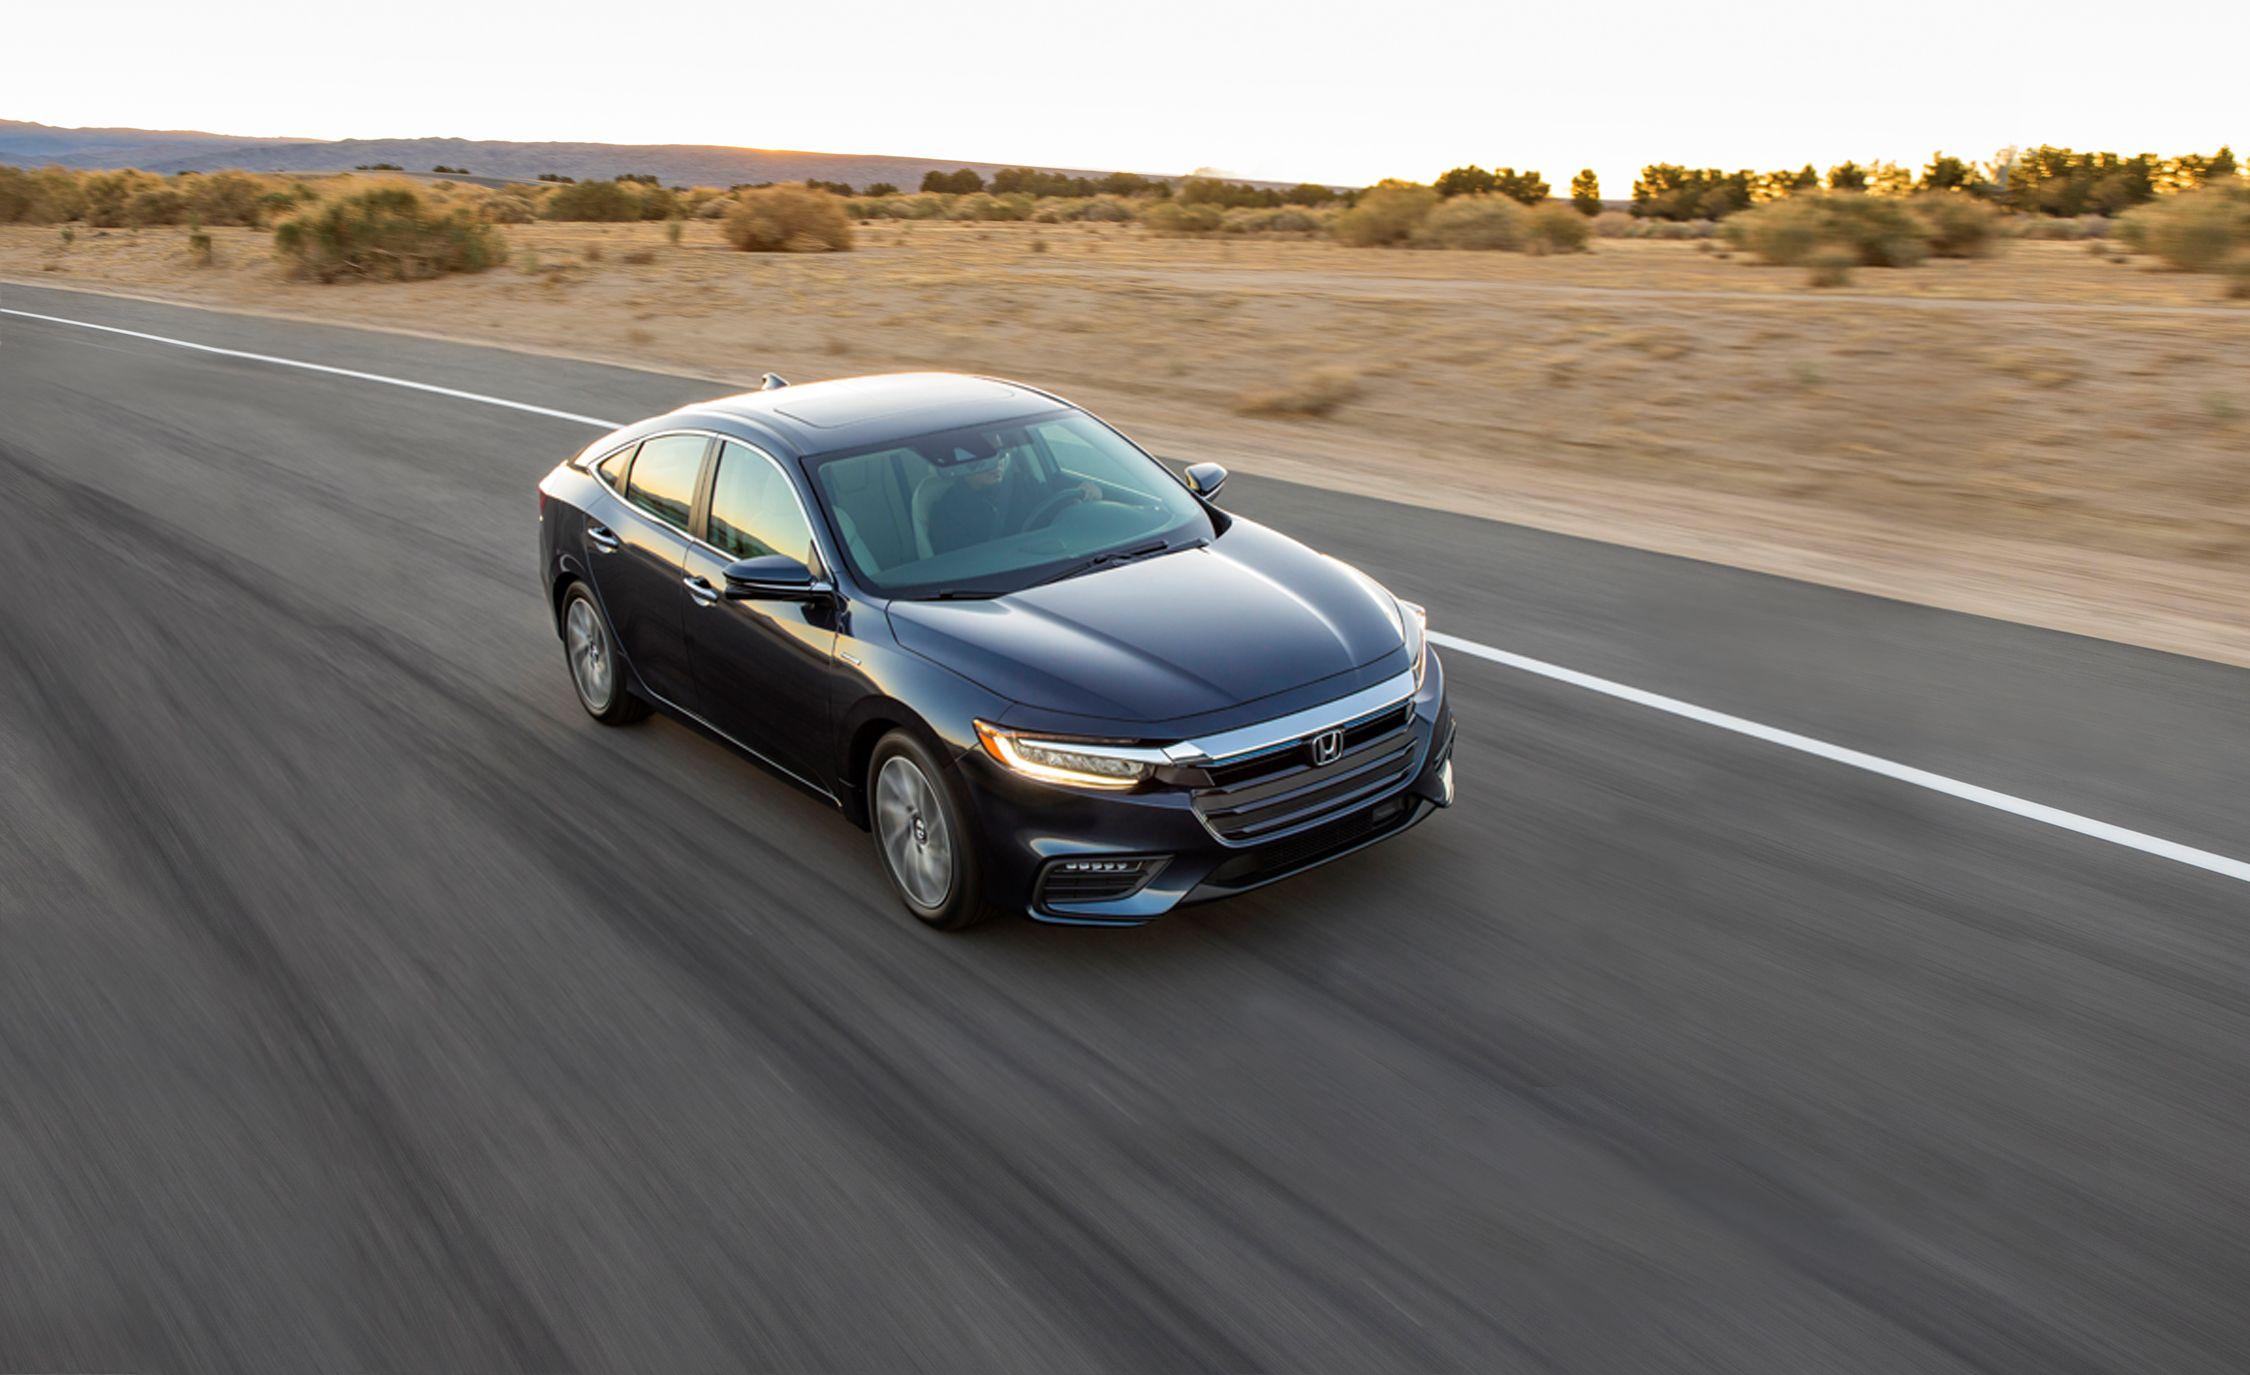 2019 Honda Insight: The 50 MPG Civic Hybrid Returns